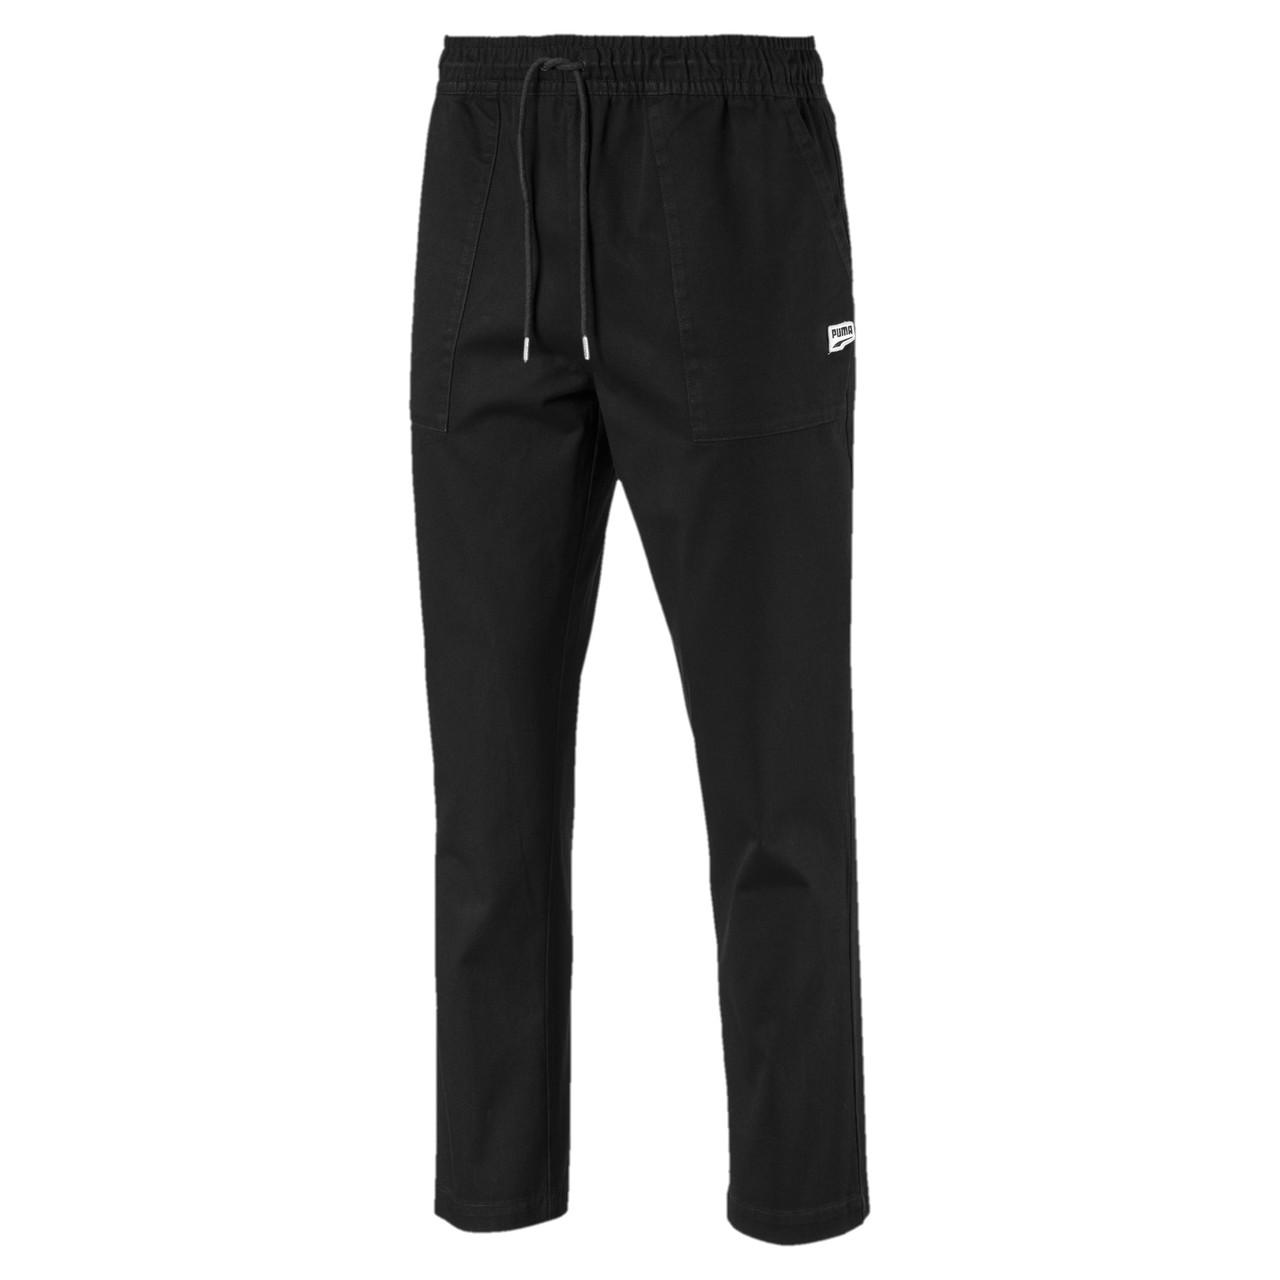 Мужские спортивные брюки Downtown Twill Knitted Men's Sweatpants